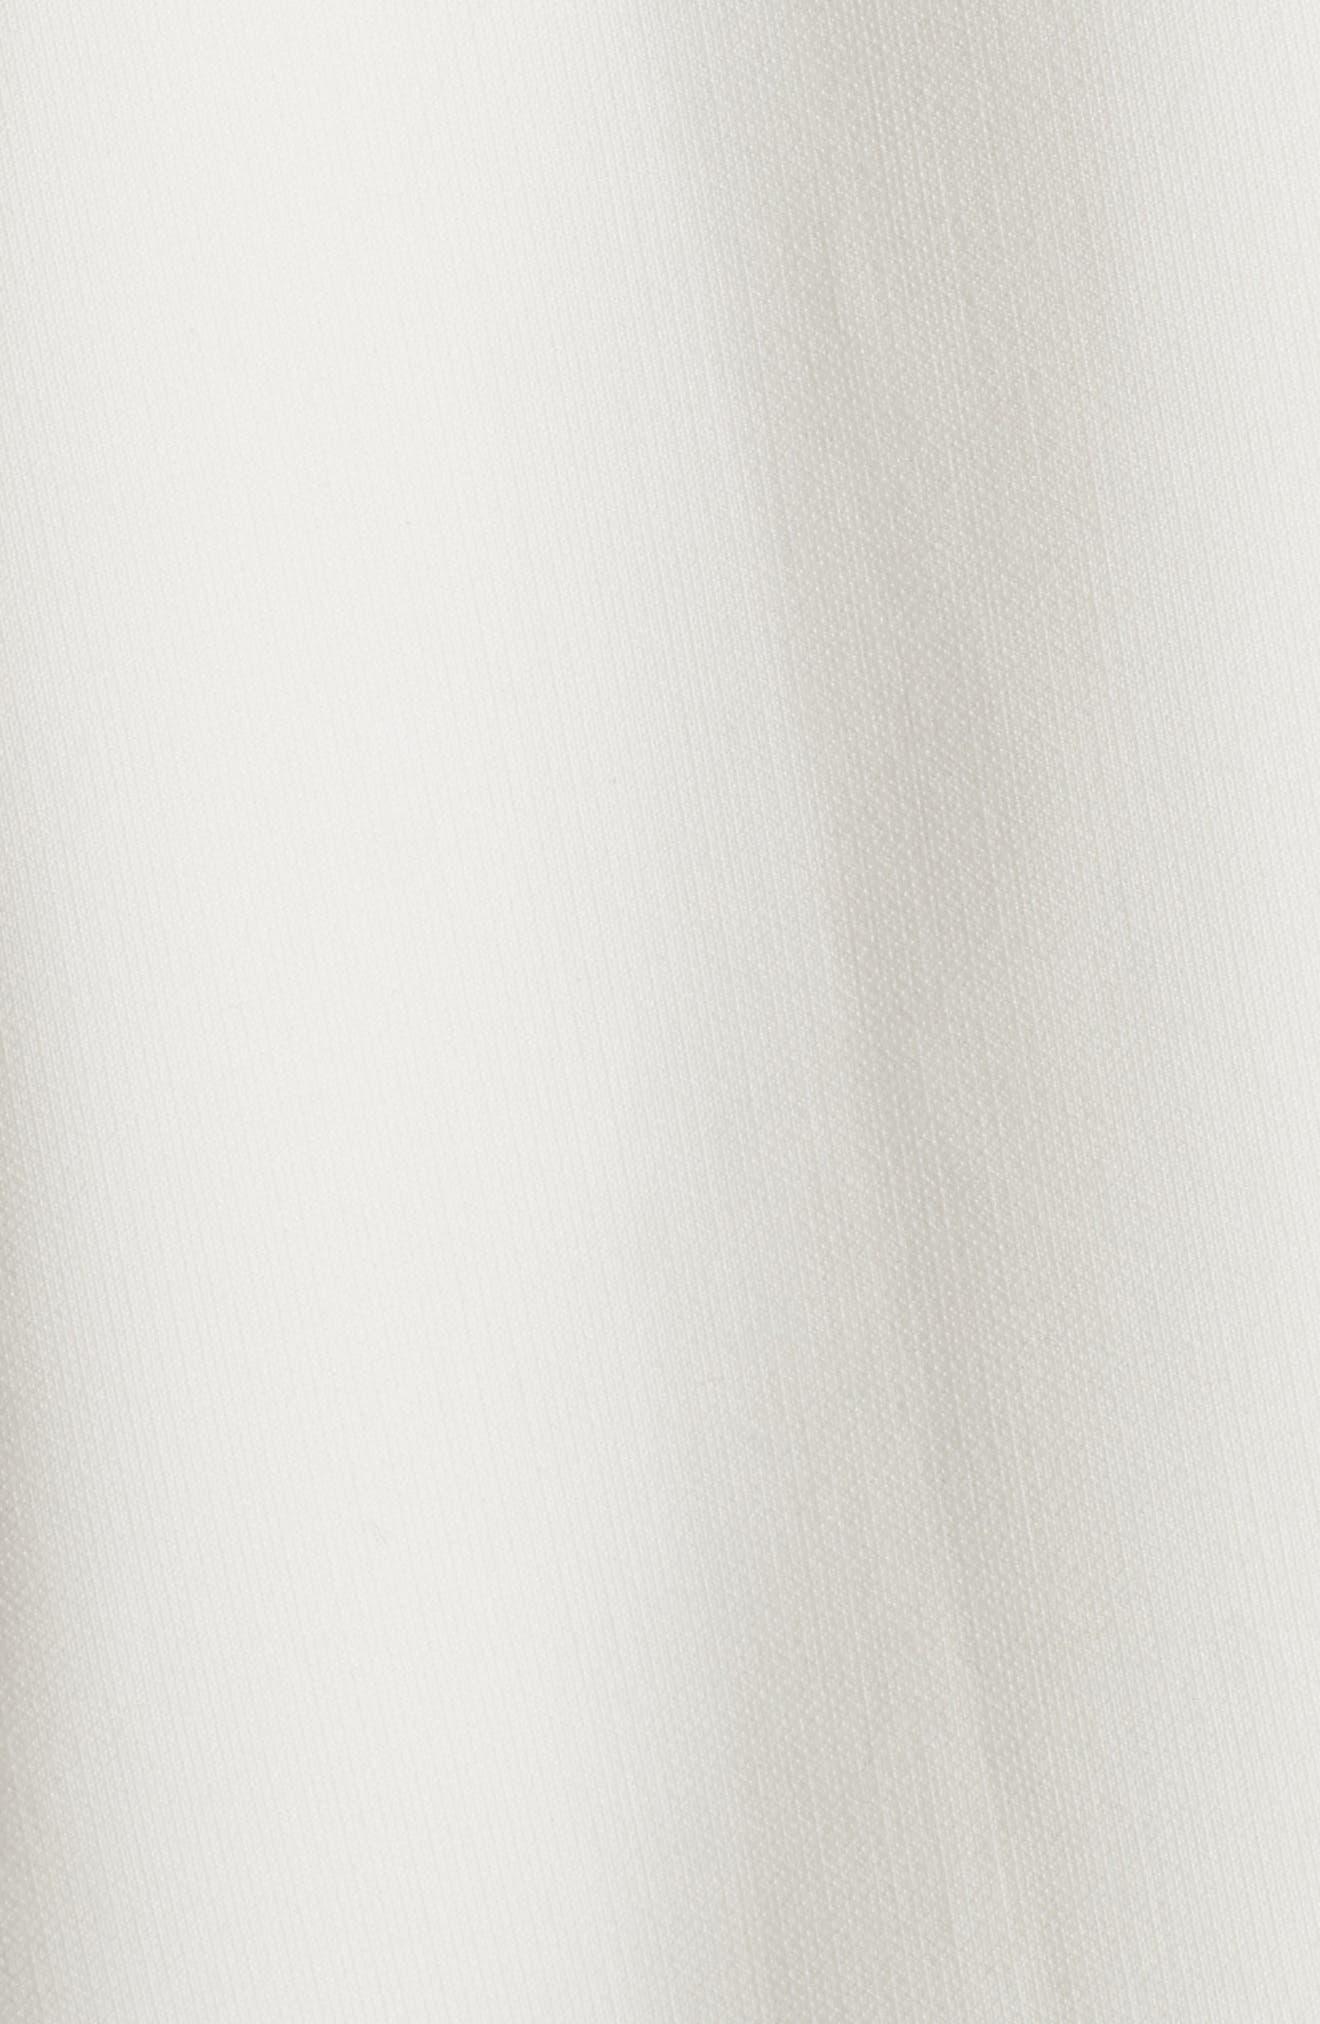 Aurora Fringe Trim Fit & Flare Dress,                             Alternate thumbnail 5, color,                             900